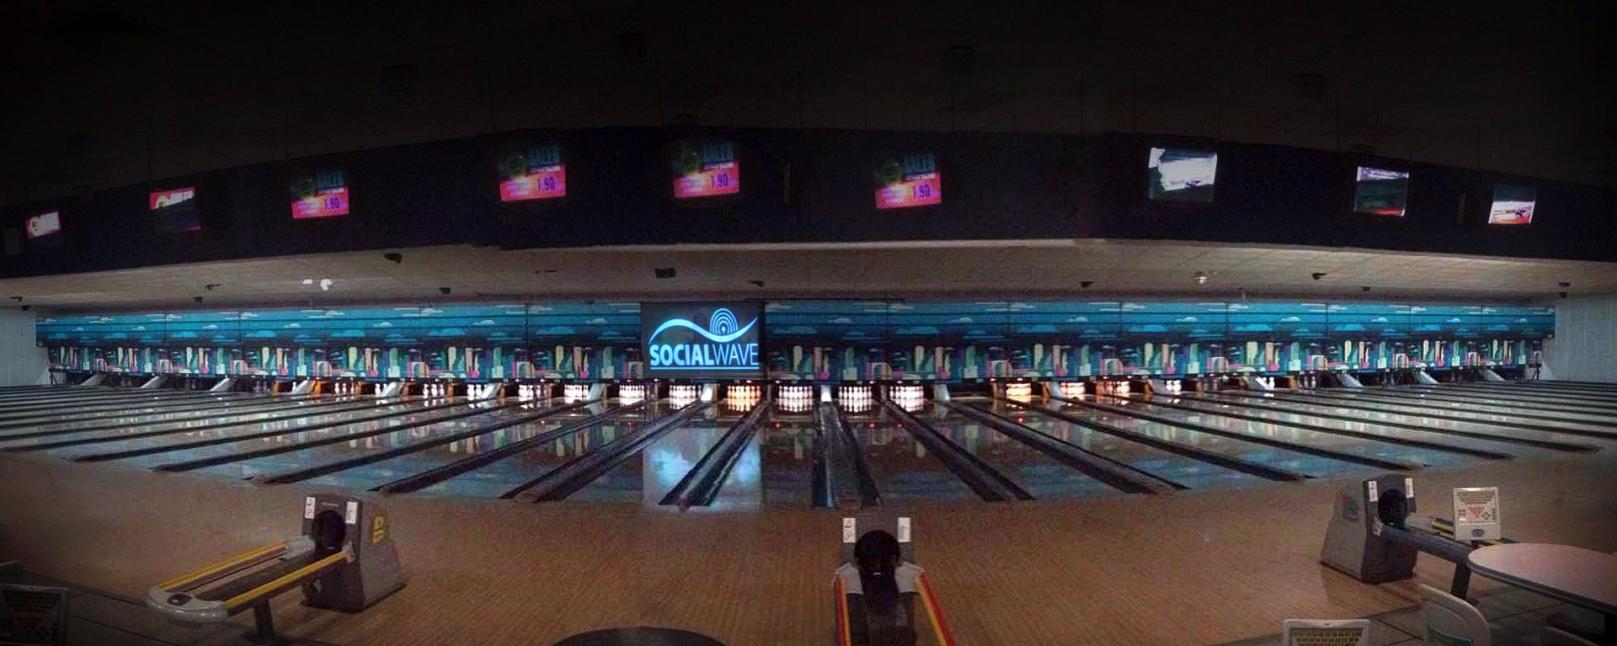 bowlingcenter monheim